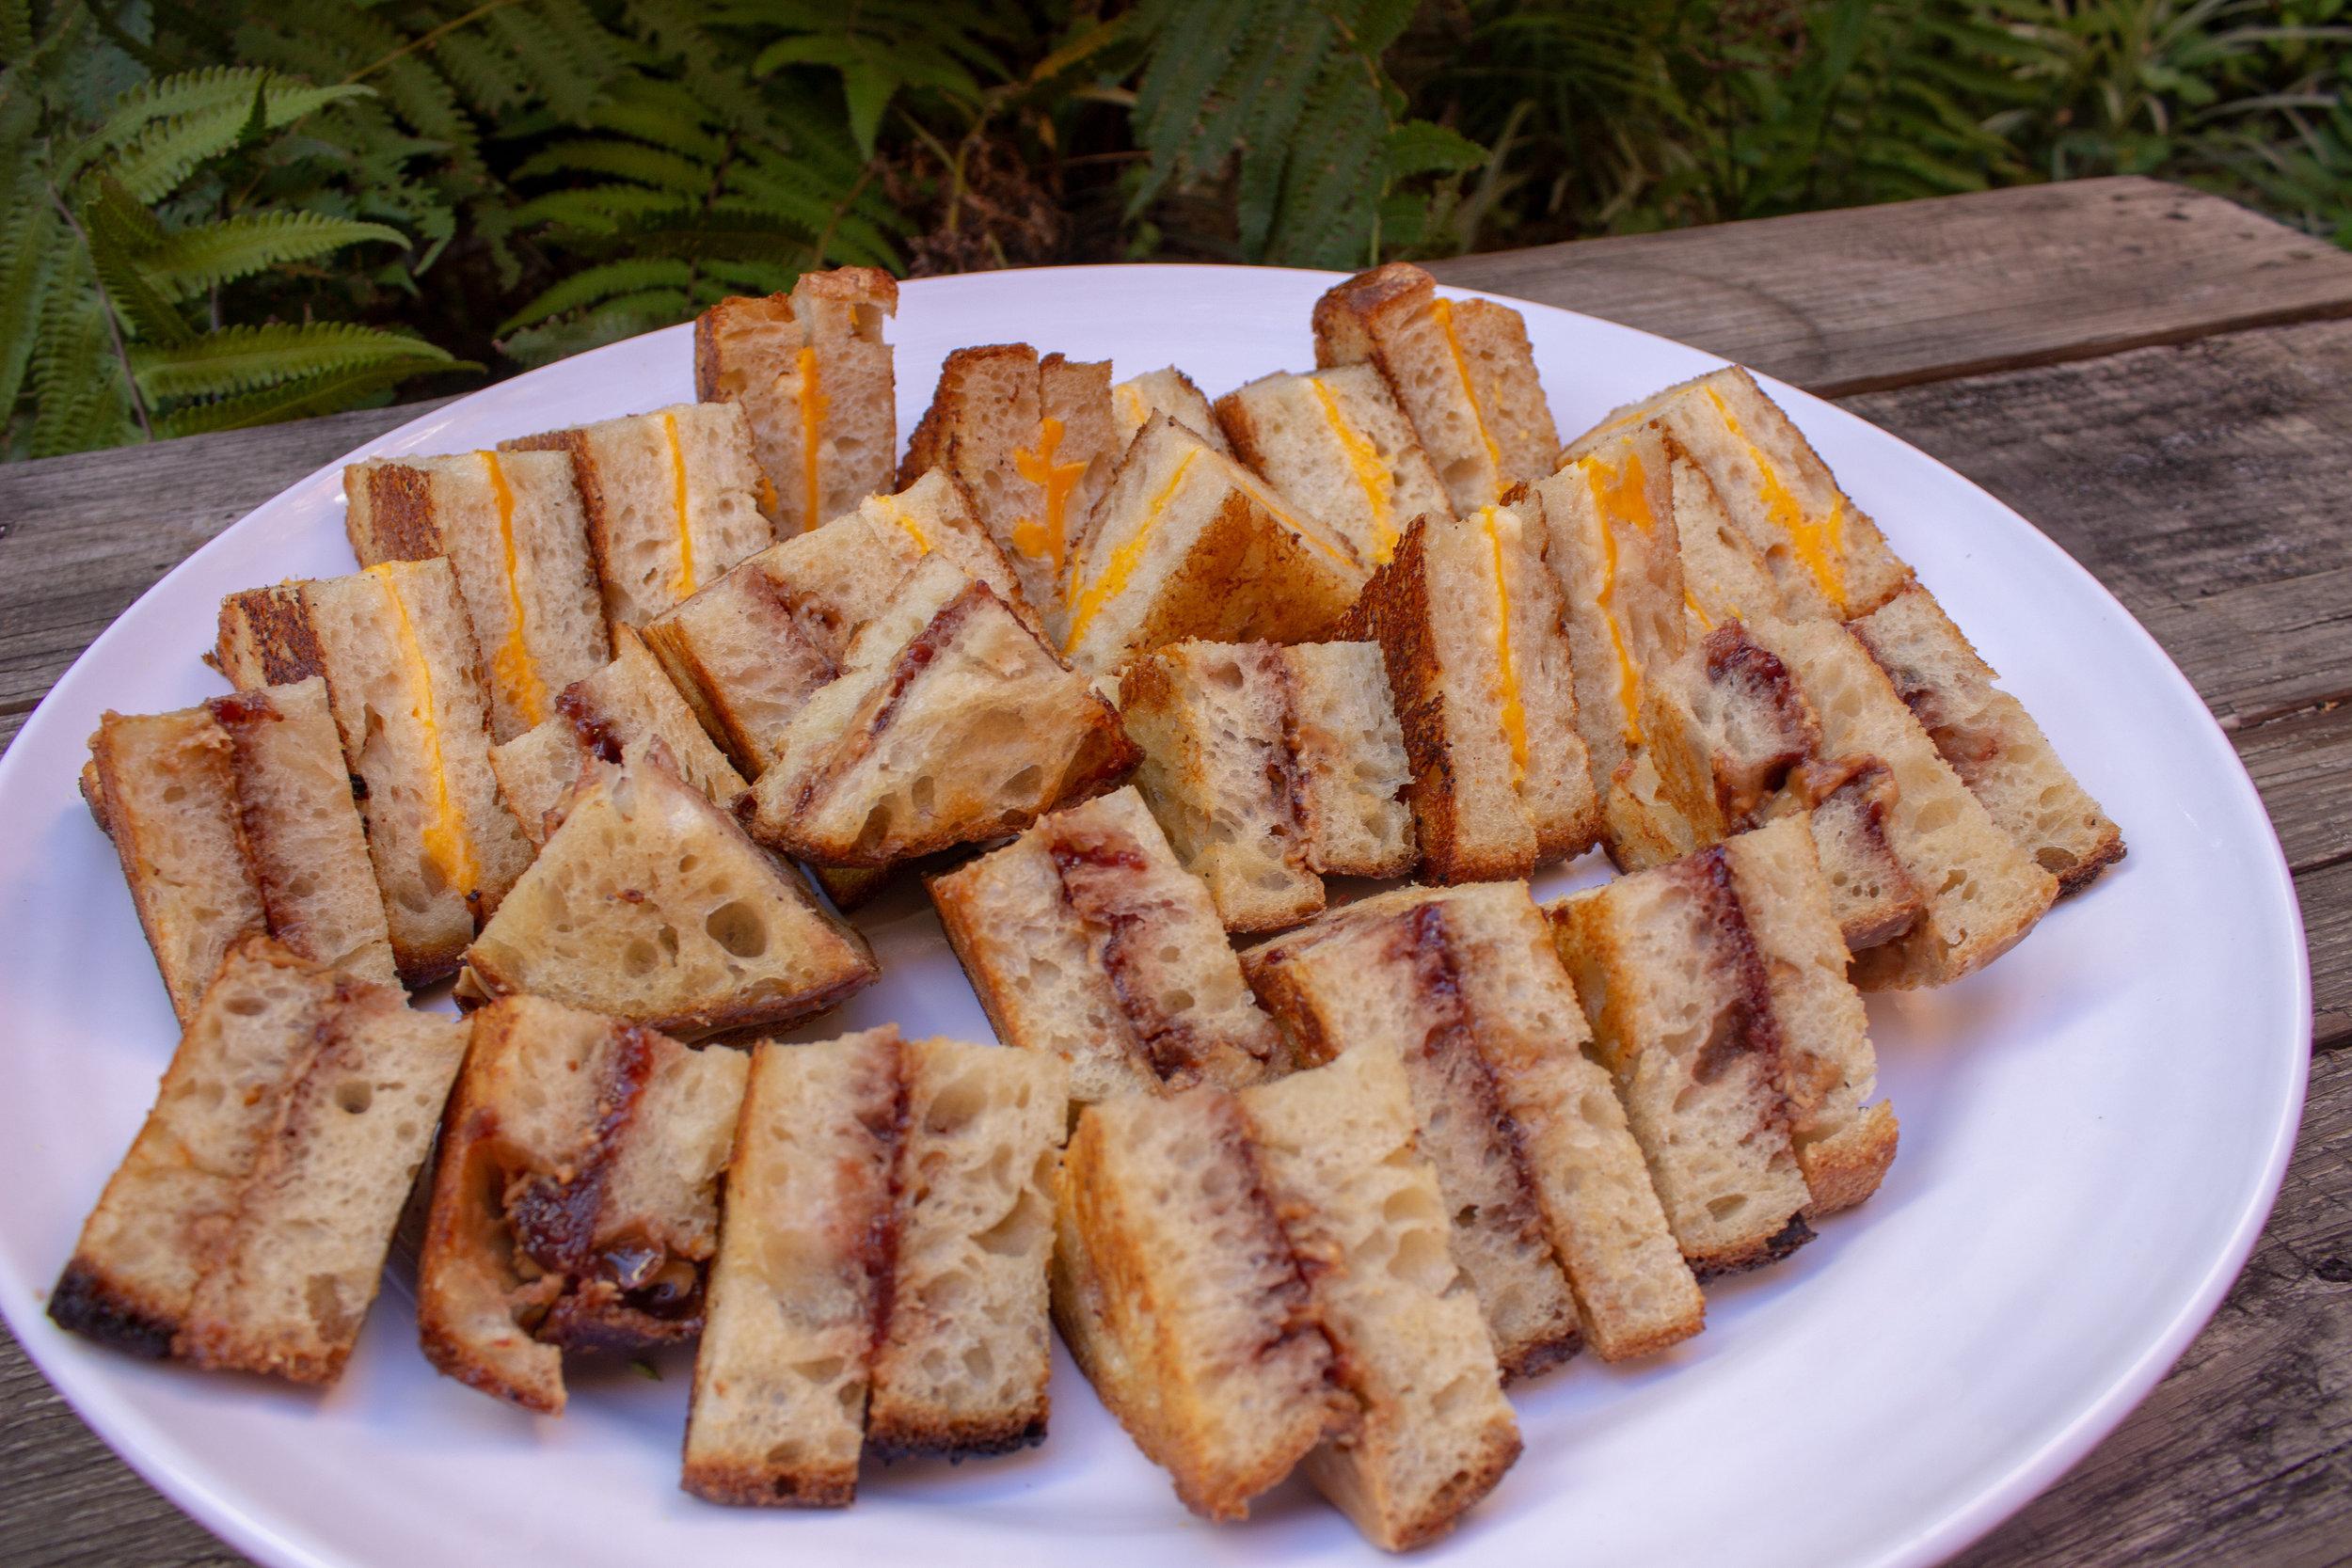 Kids' Sandwich Platter